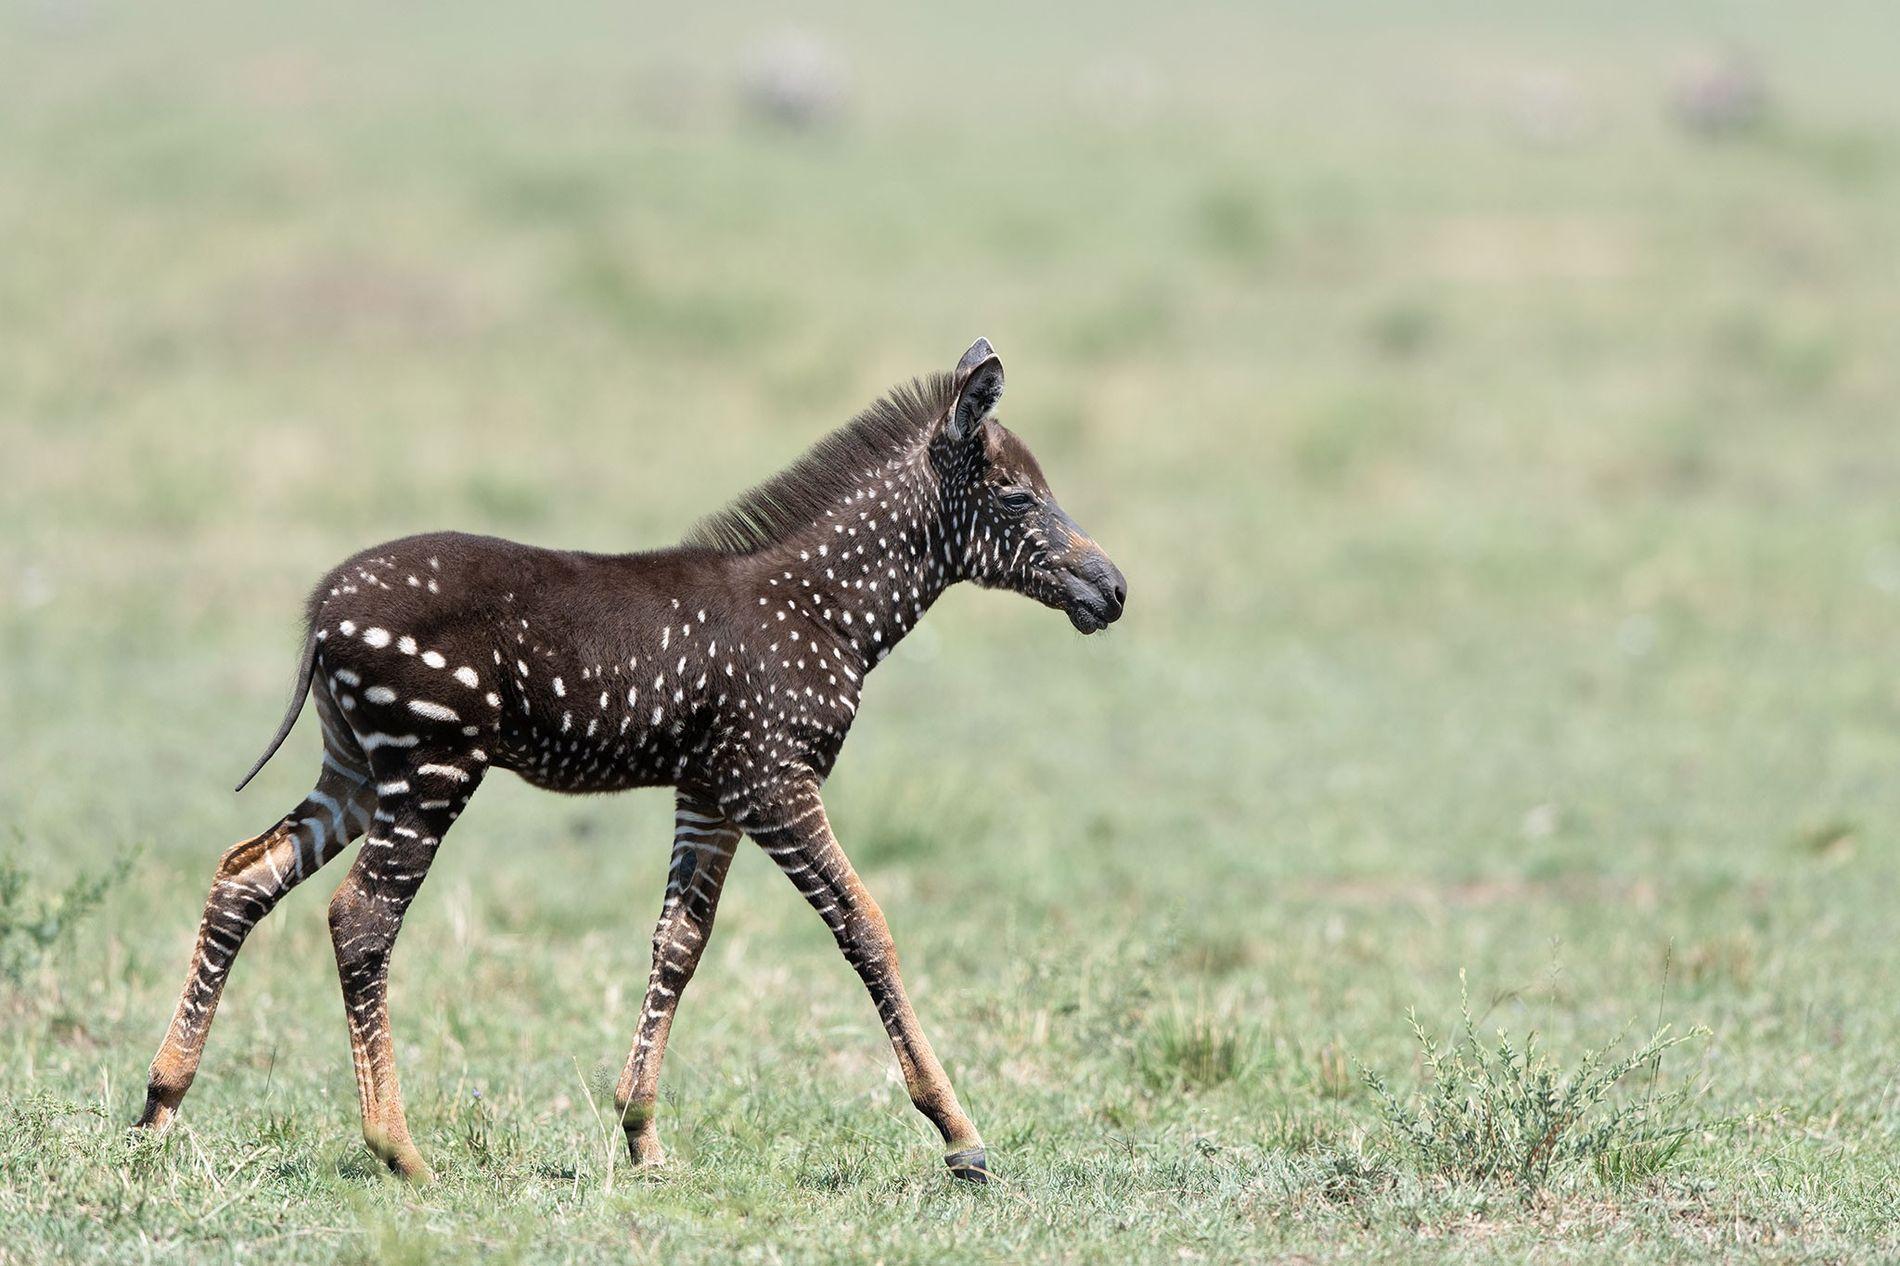 Geflecktes Zebrafohlen in Kenia entdeckt